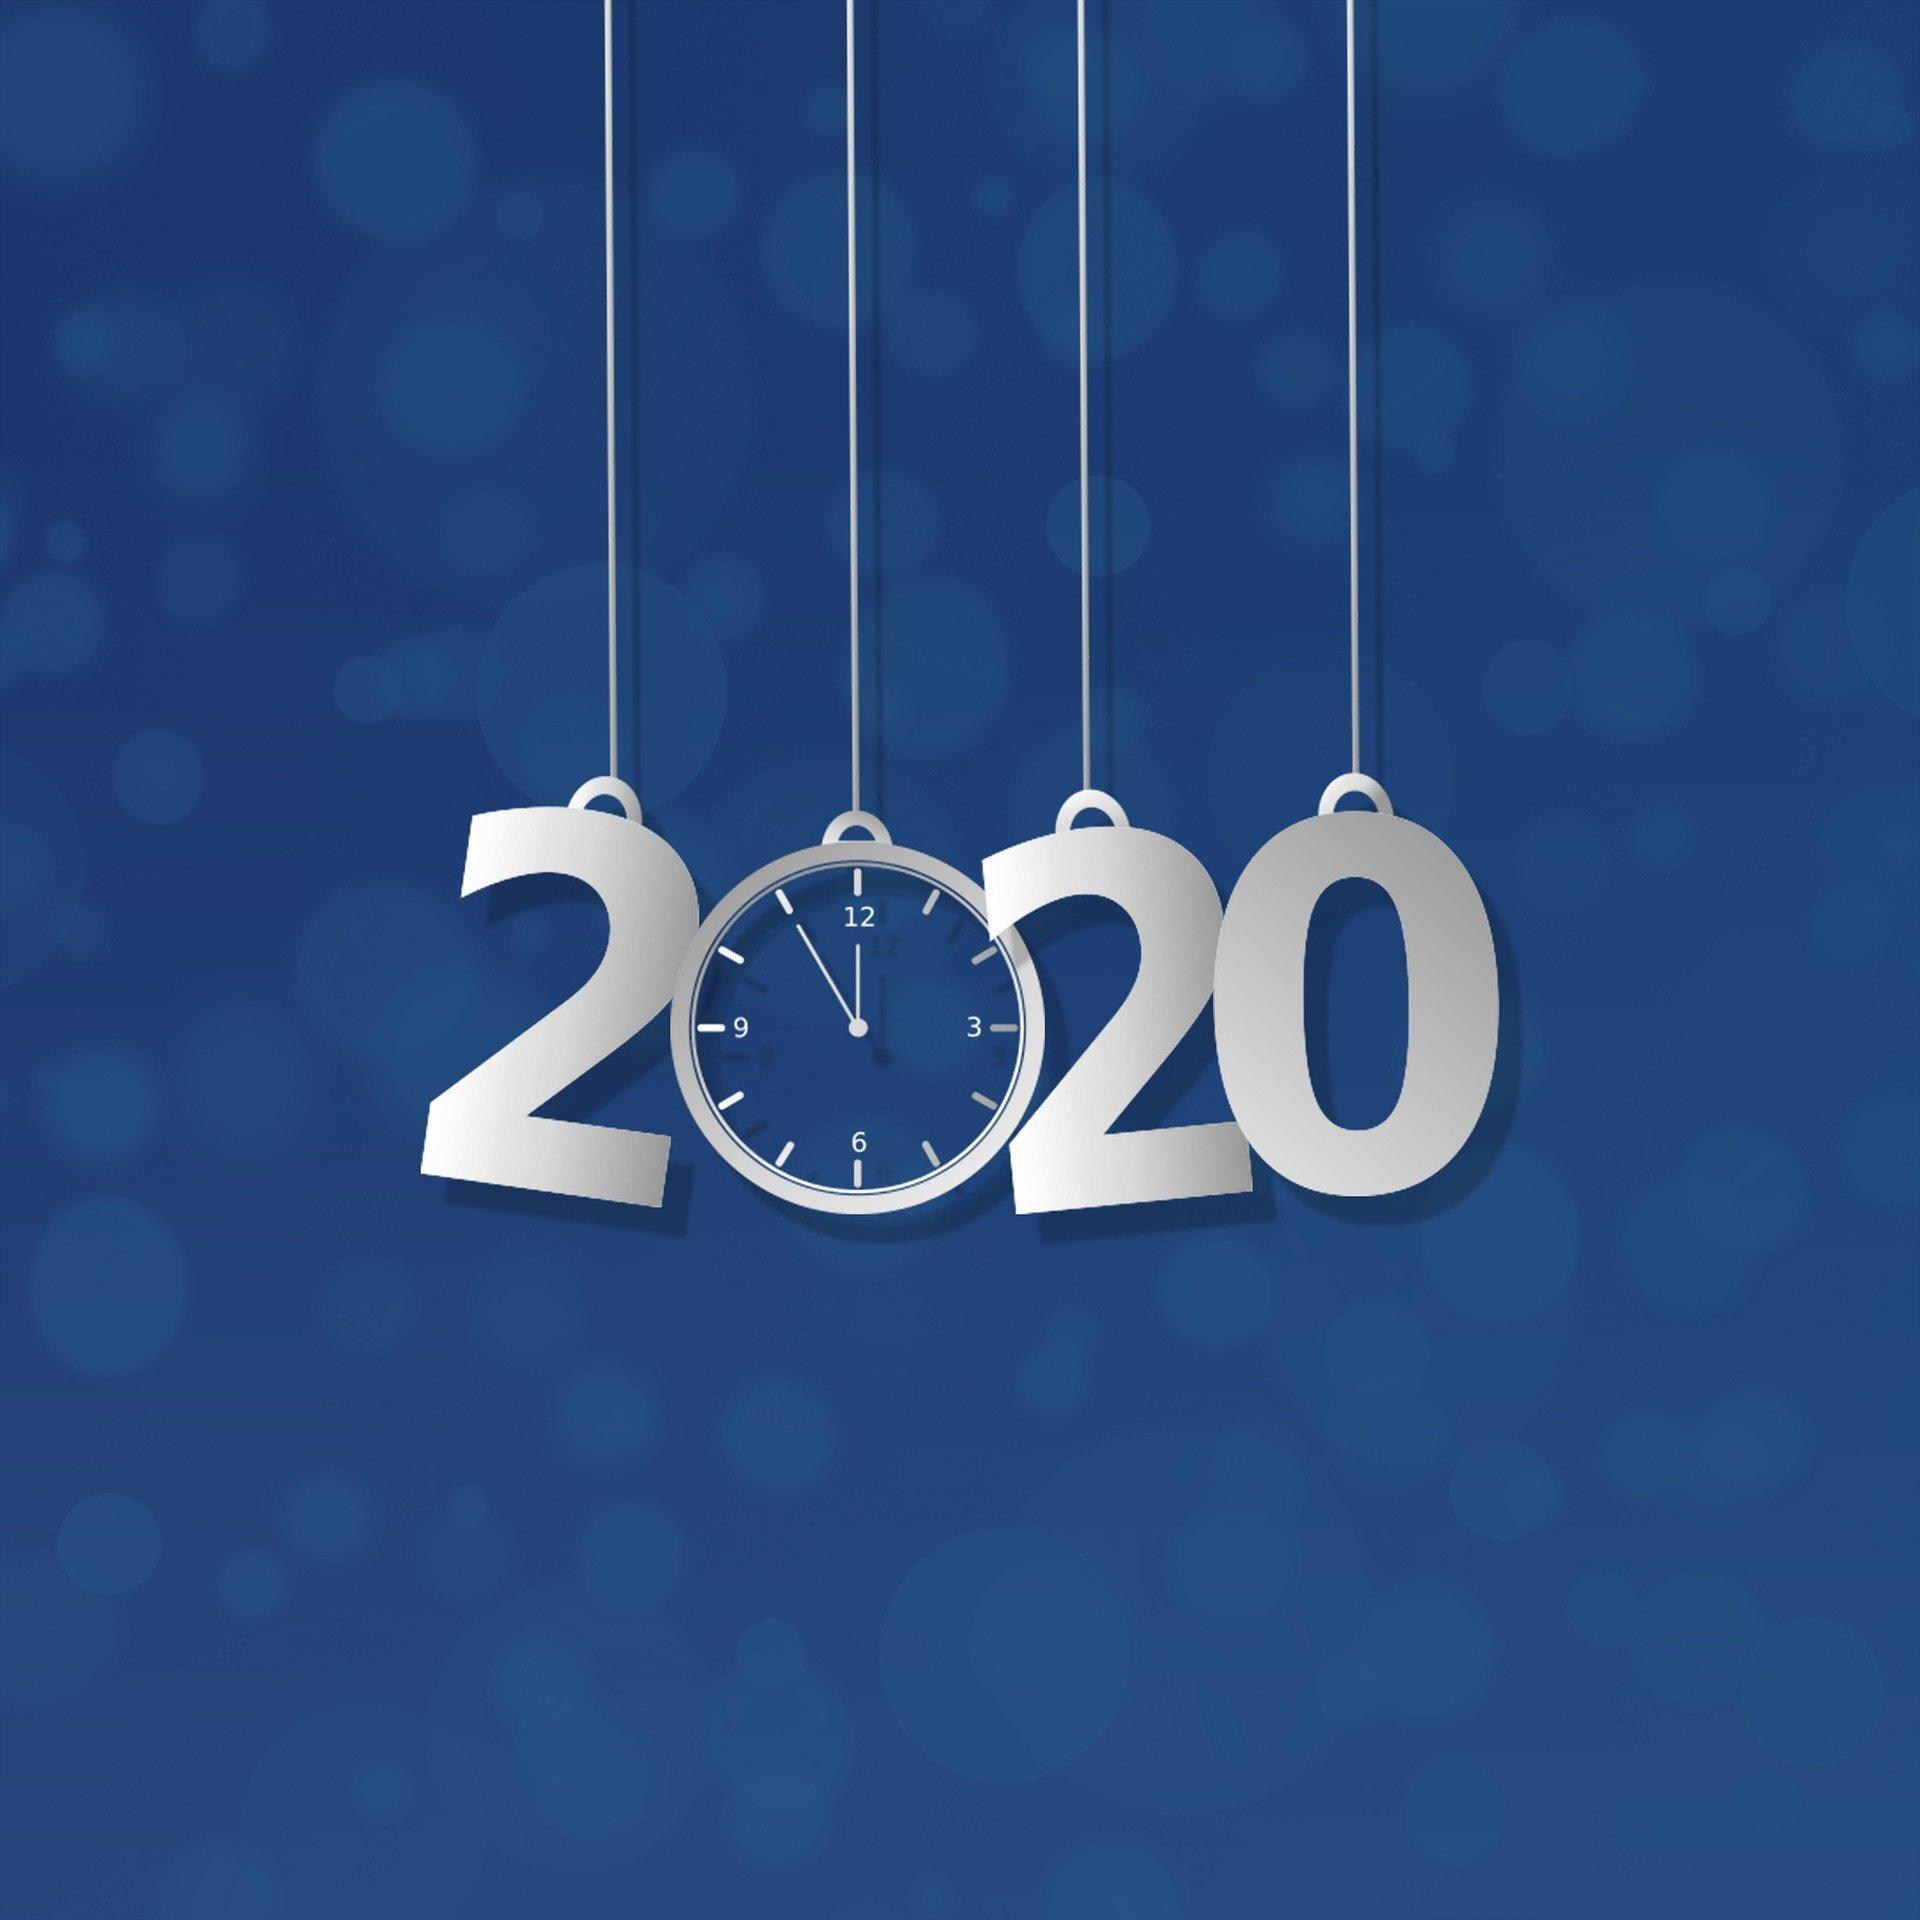 2020. zdj.Pixabay